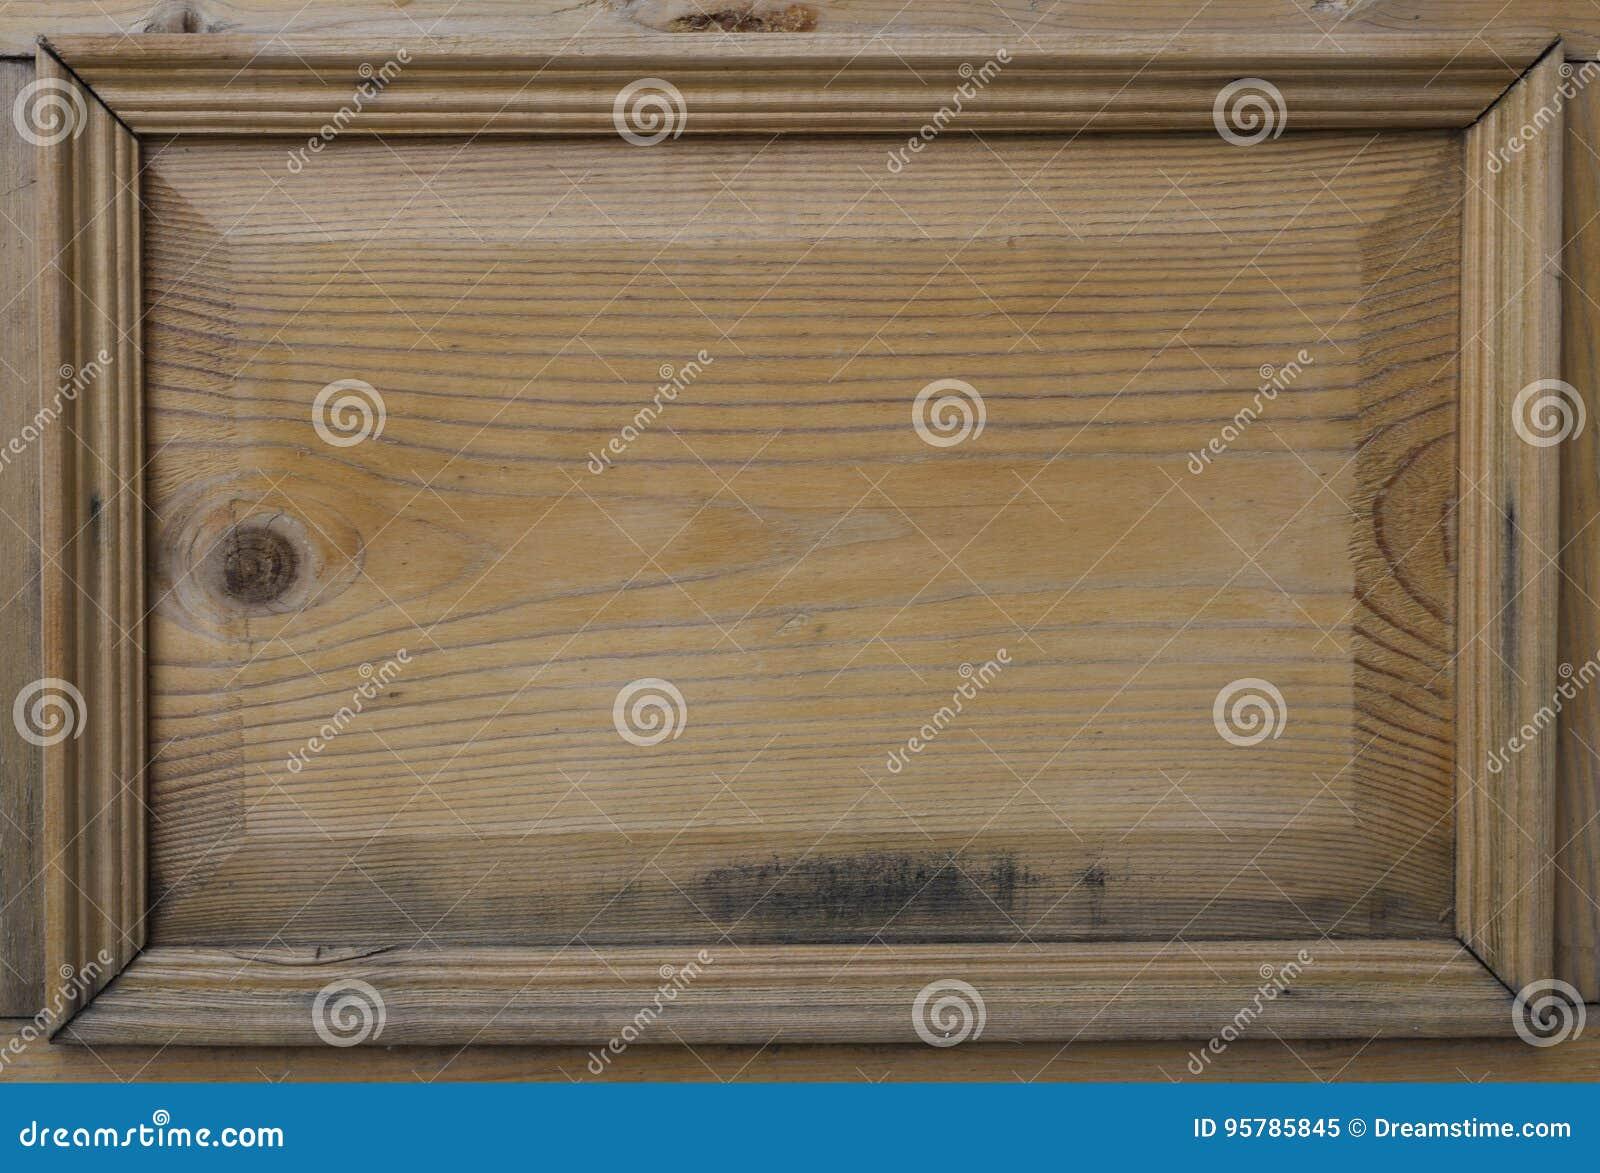 Wood texture wooden plank - Wood Texture Wooden Plank Grain Background Striped Timber Desk Stock Photo